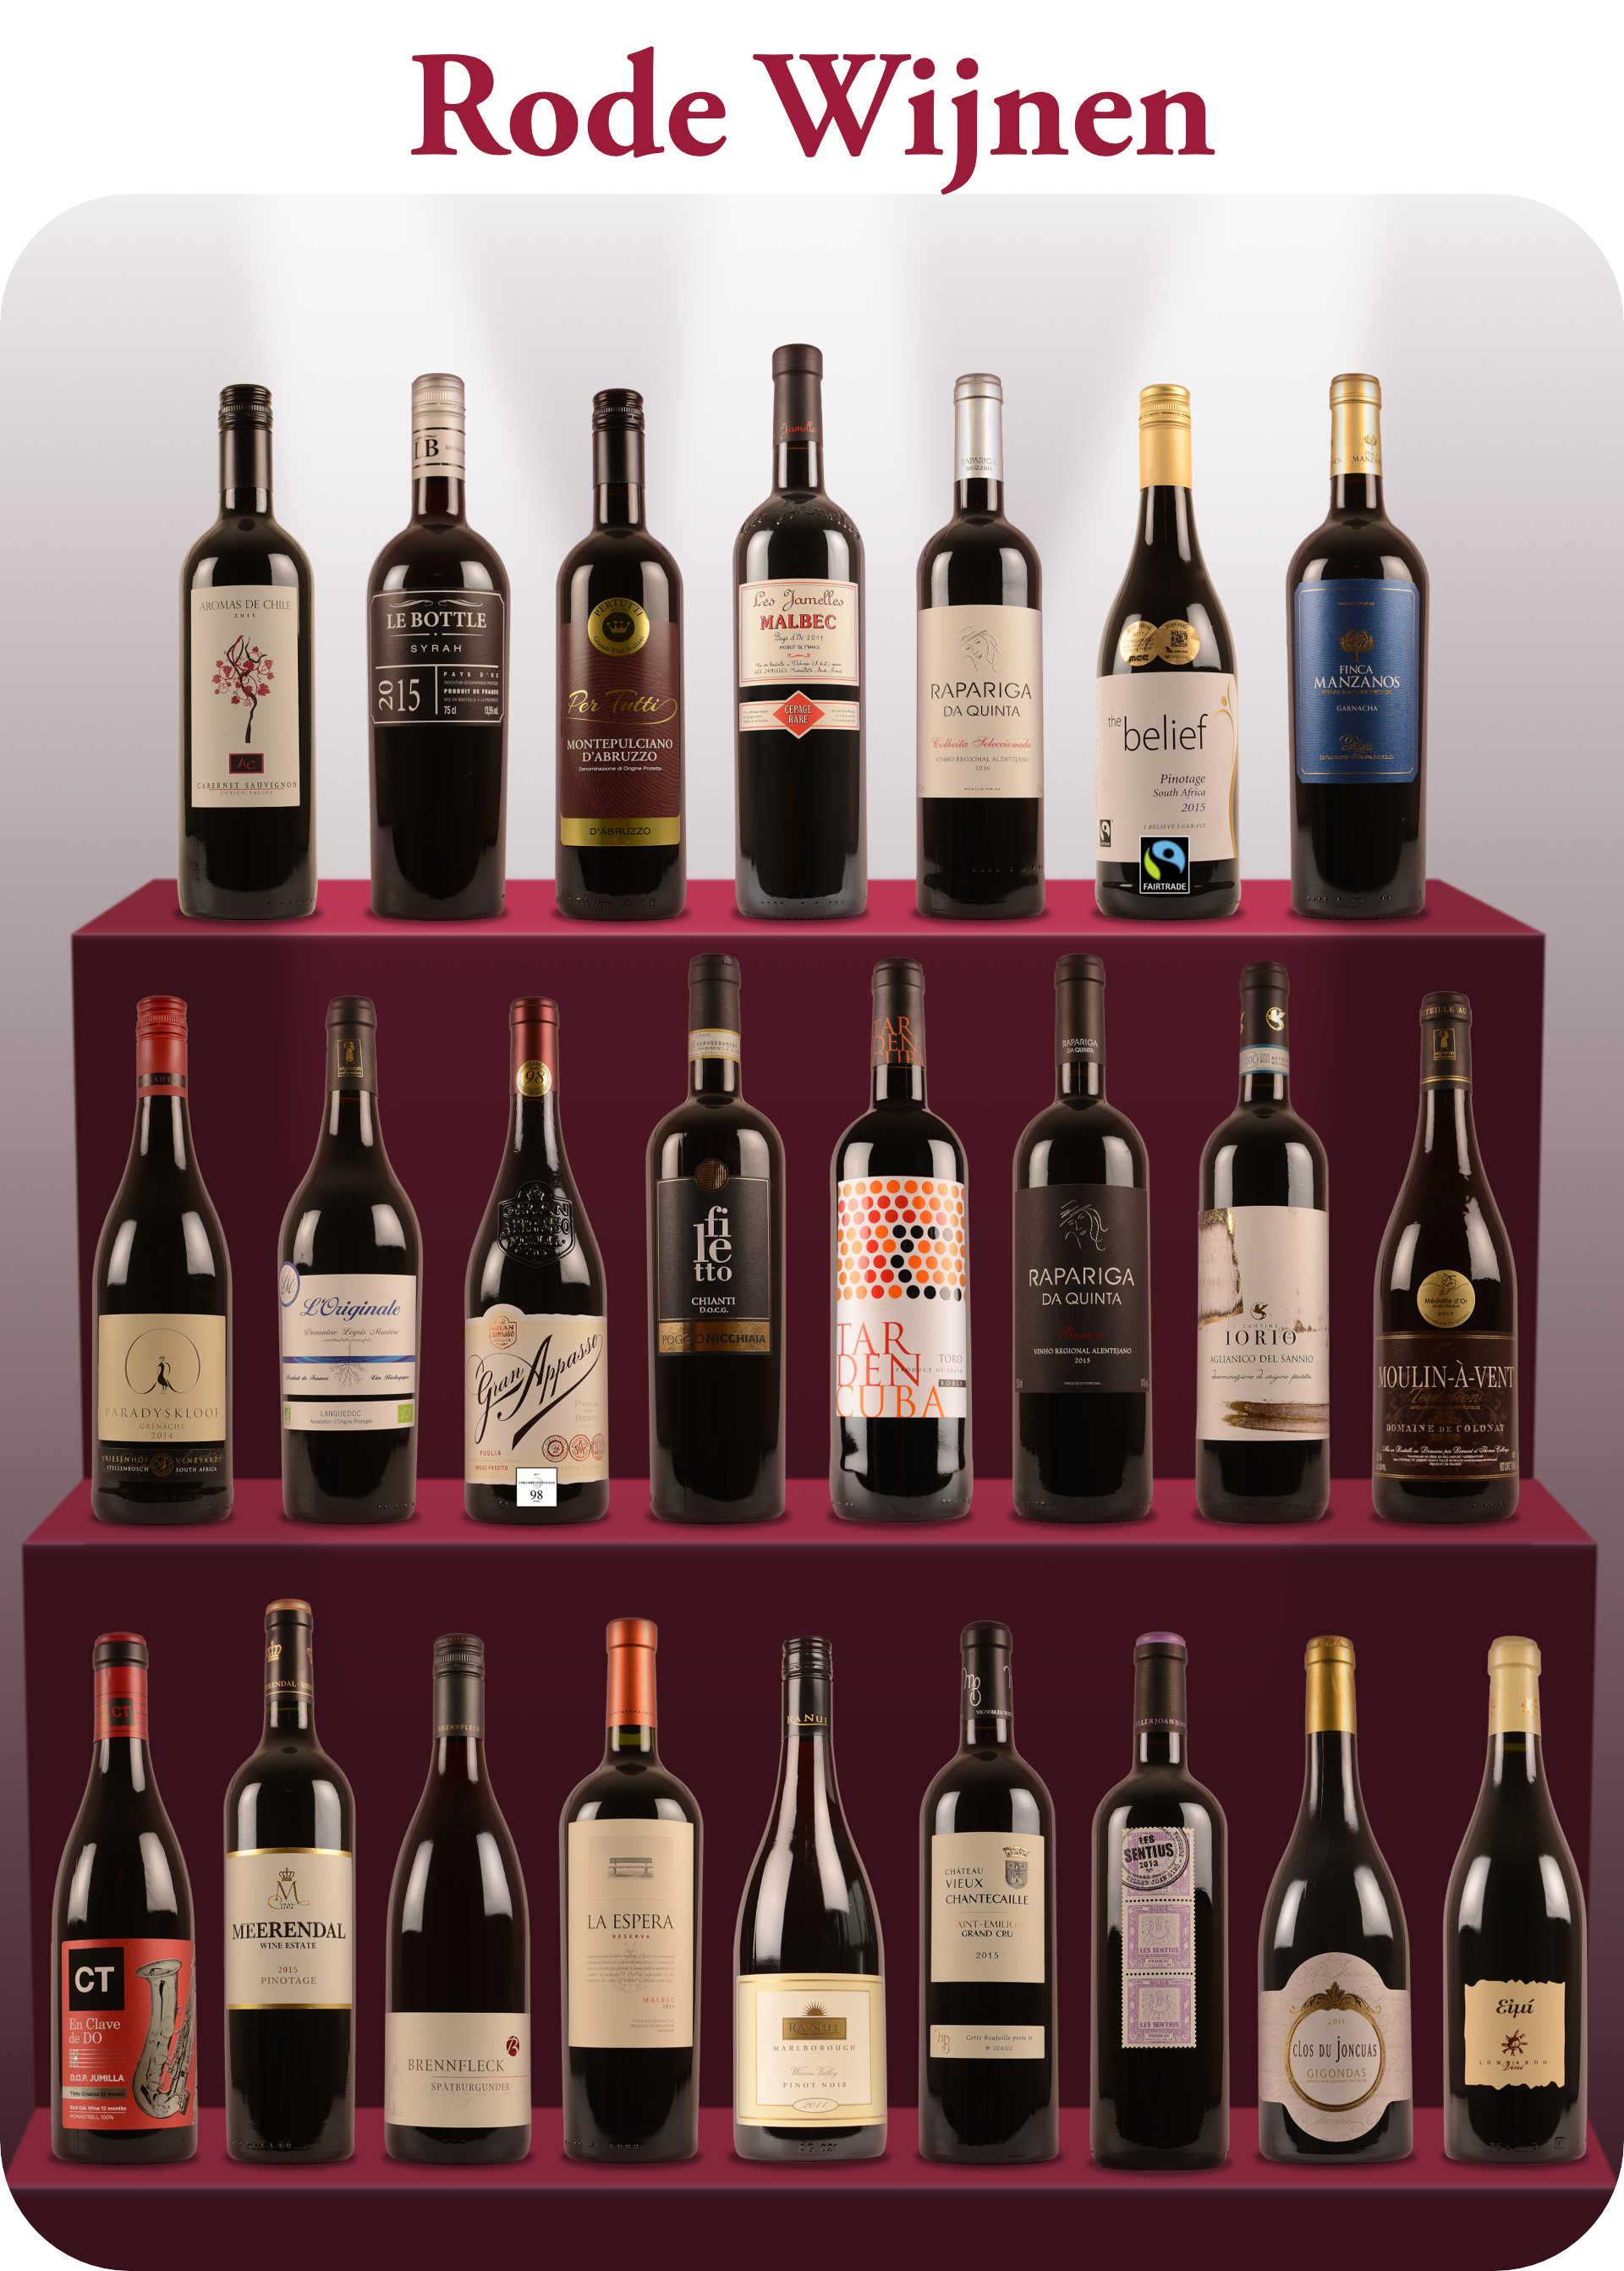 Lente Open Fles rode wijnen